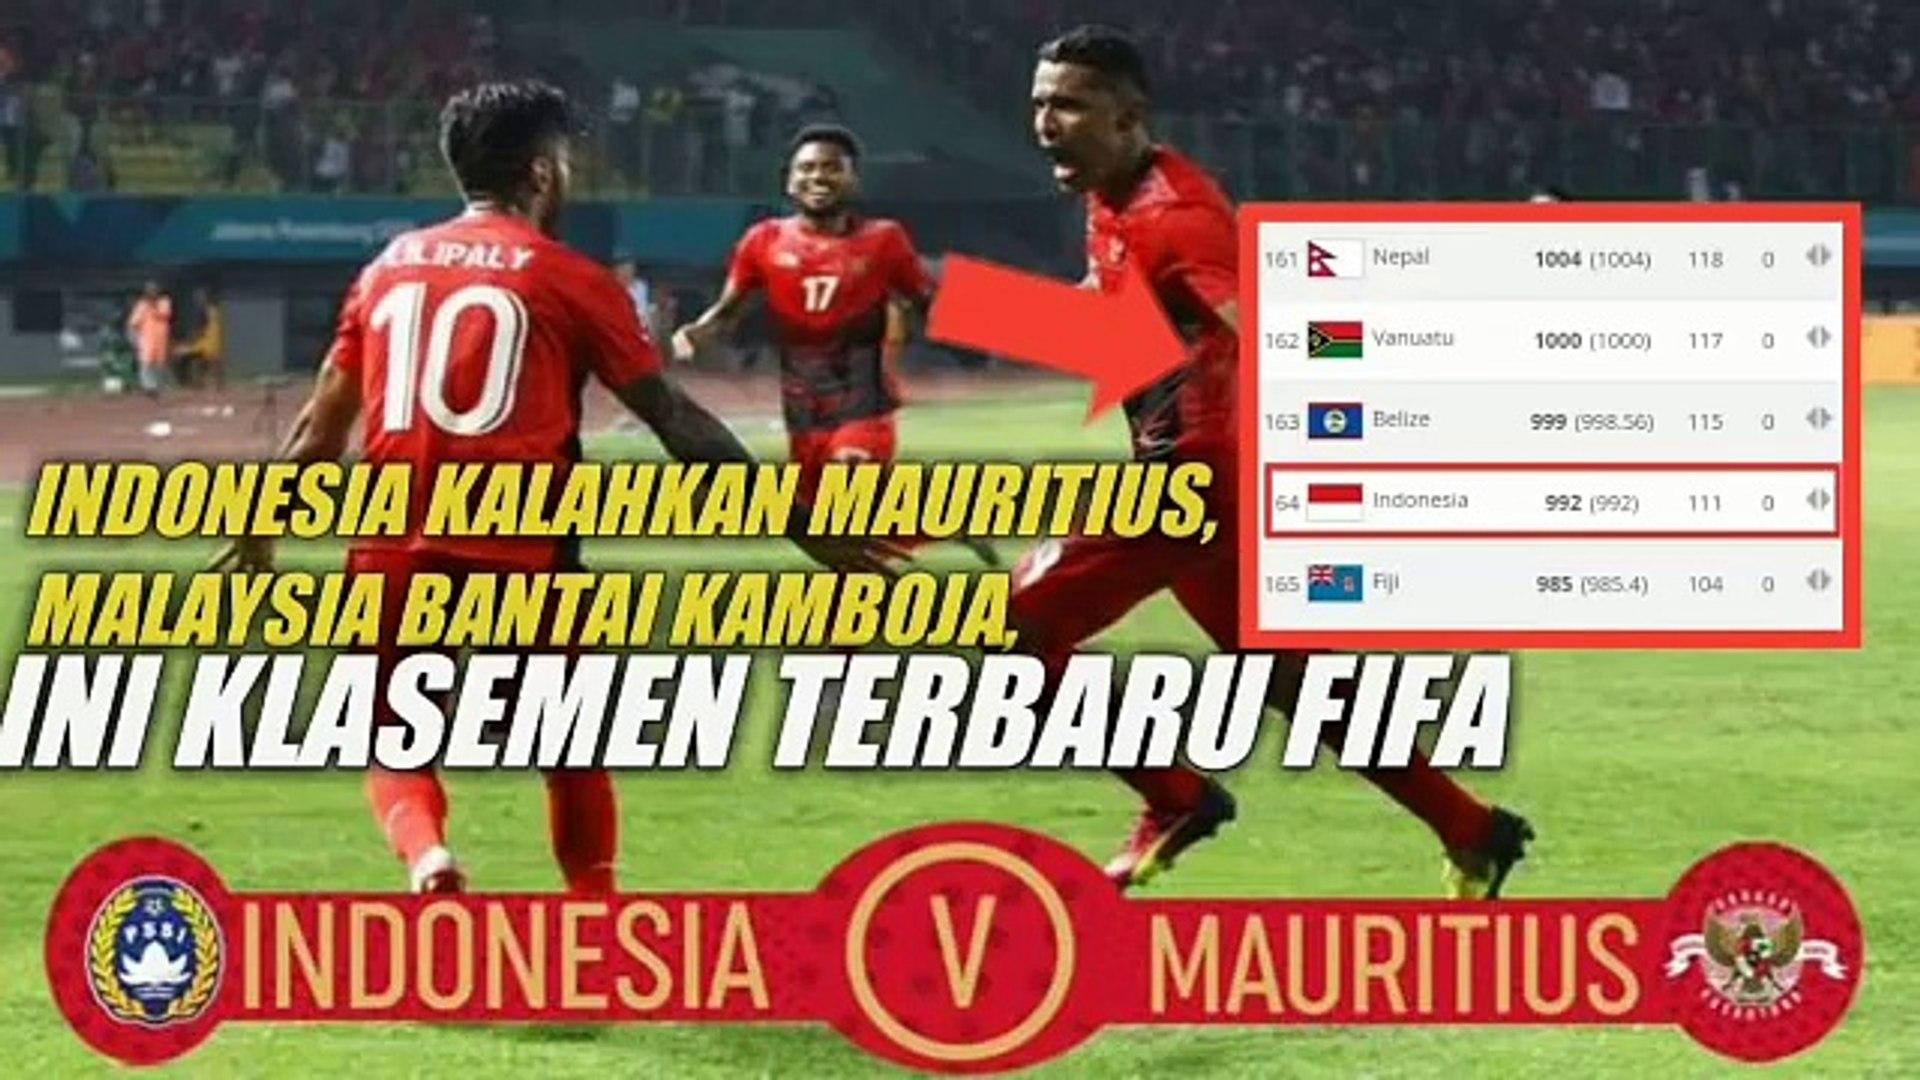 Indonesia Kalahkan Mauritius, Malaysia Bantai Kamboja, Ini Klasemen Terbaru FIFA